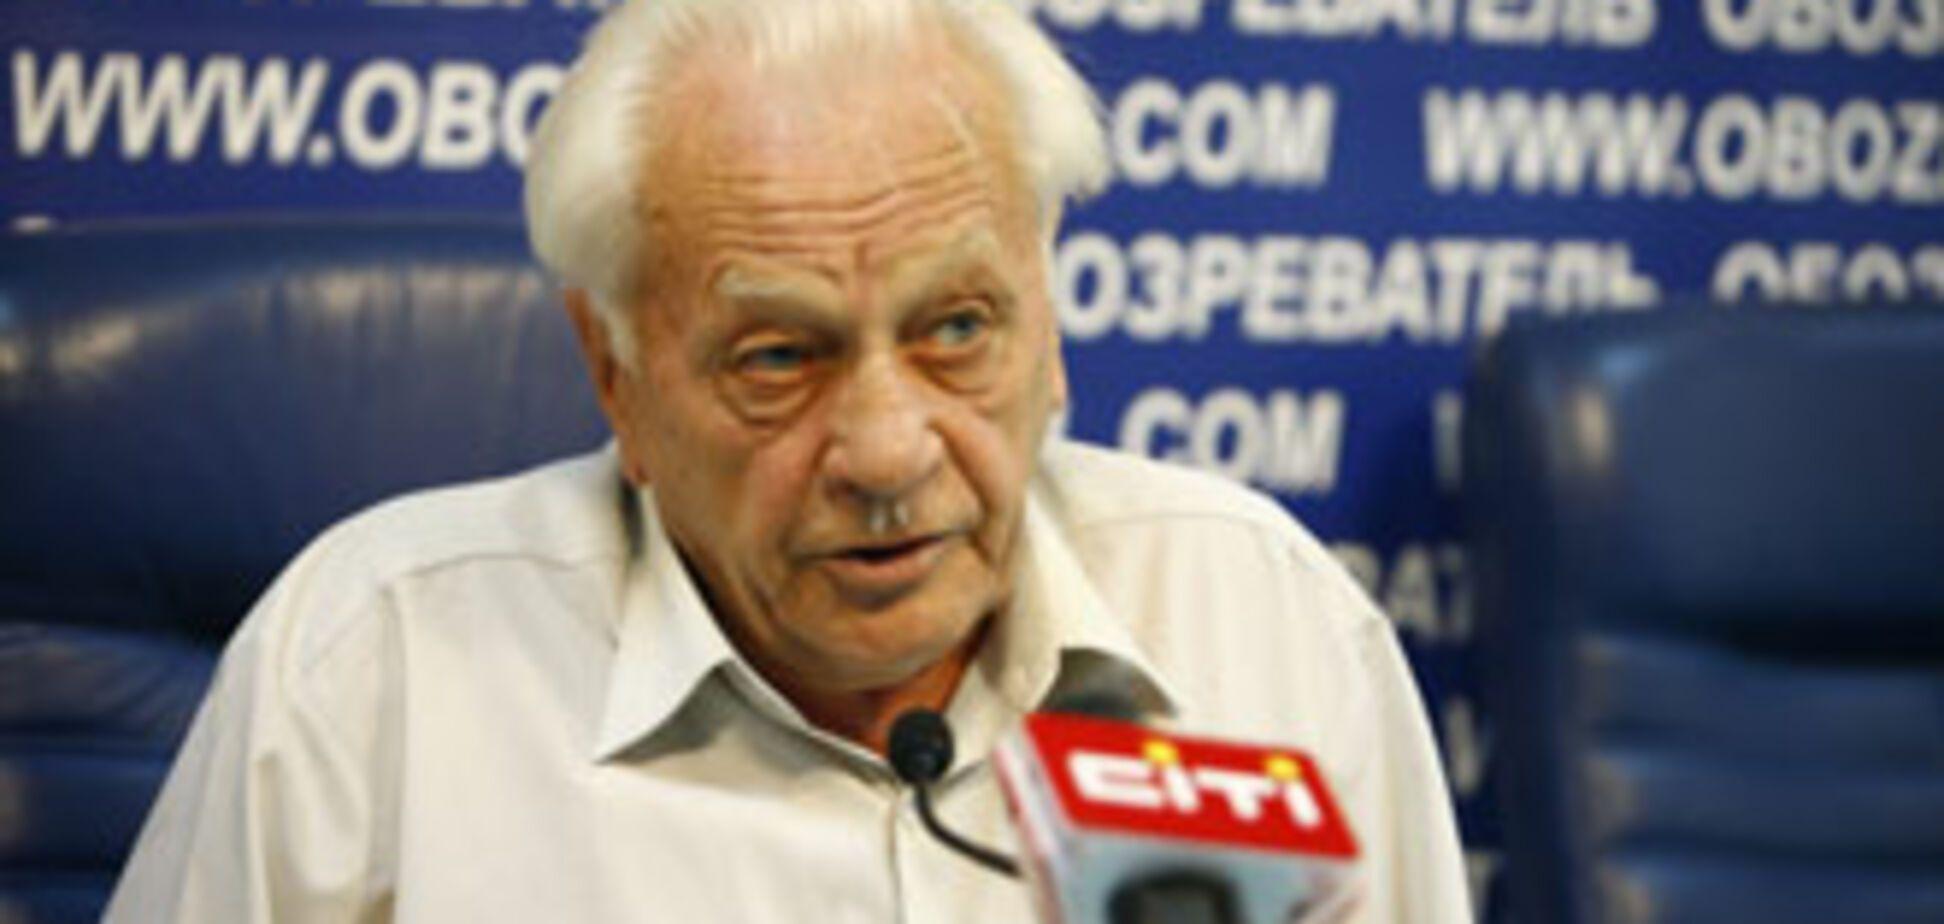 Хмара: Табачника - під суд, Литвин - провокатор